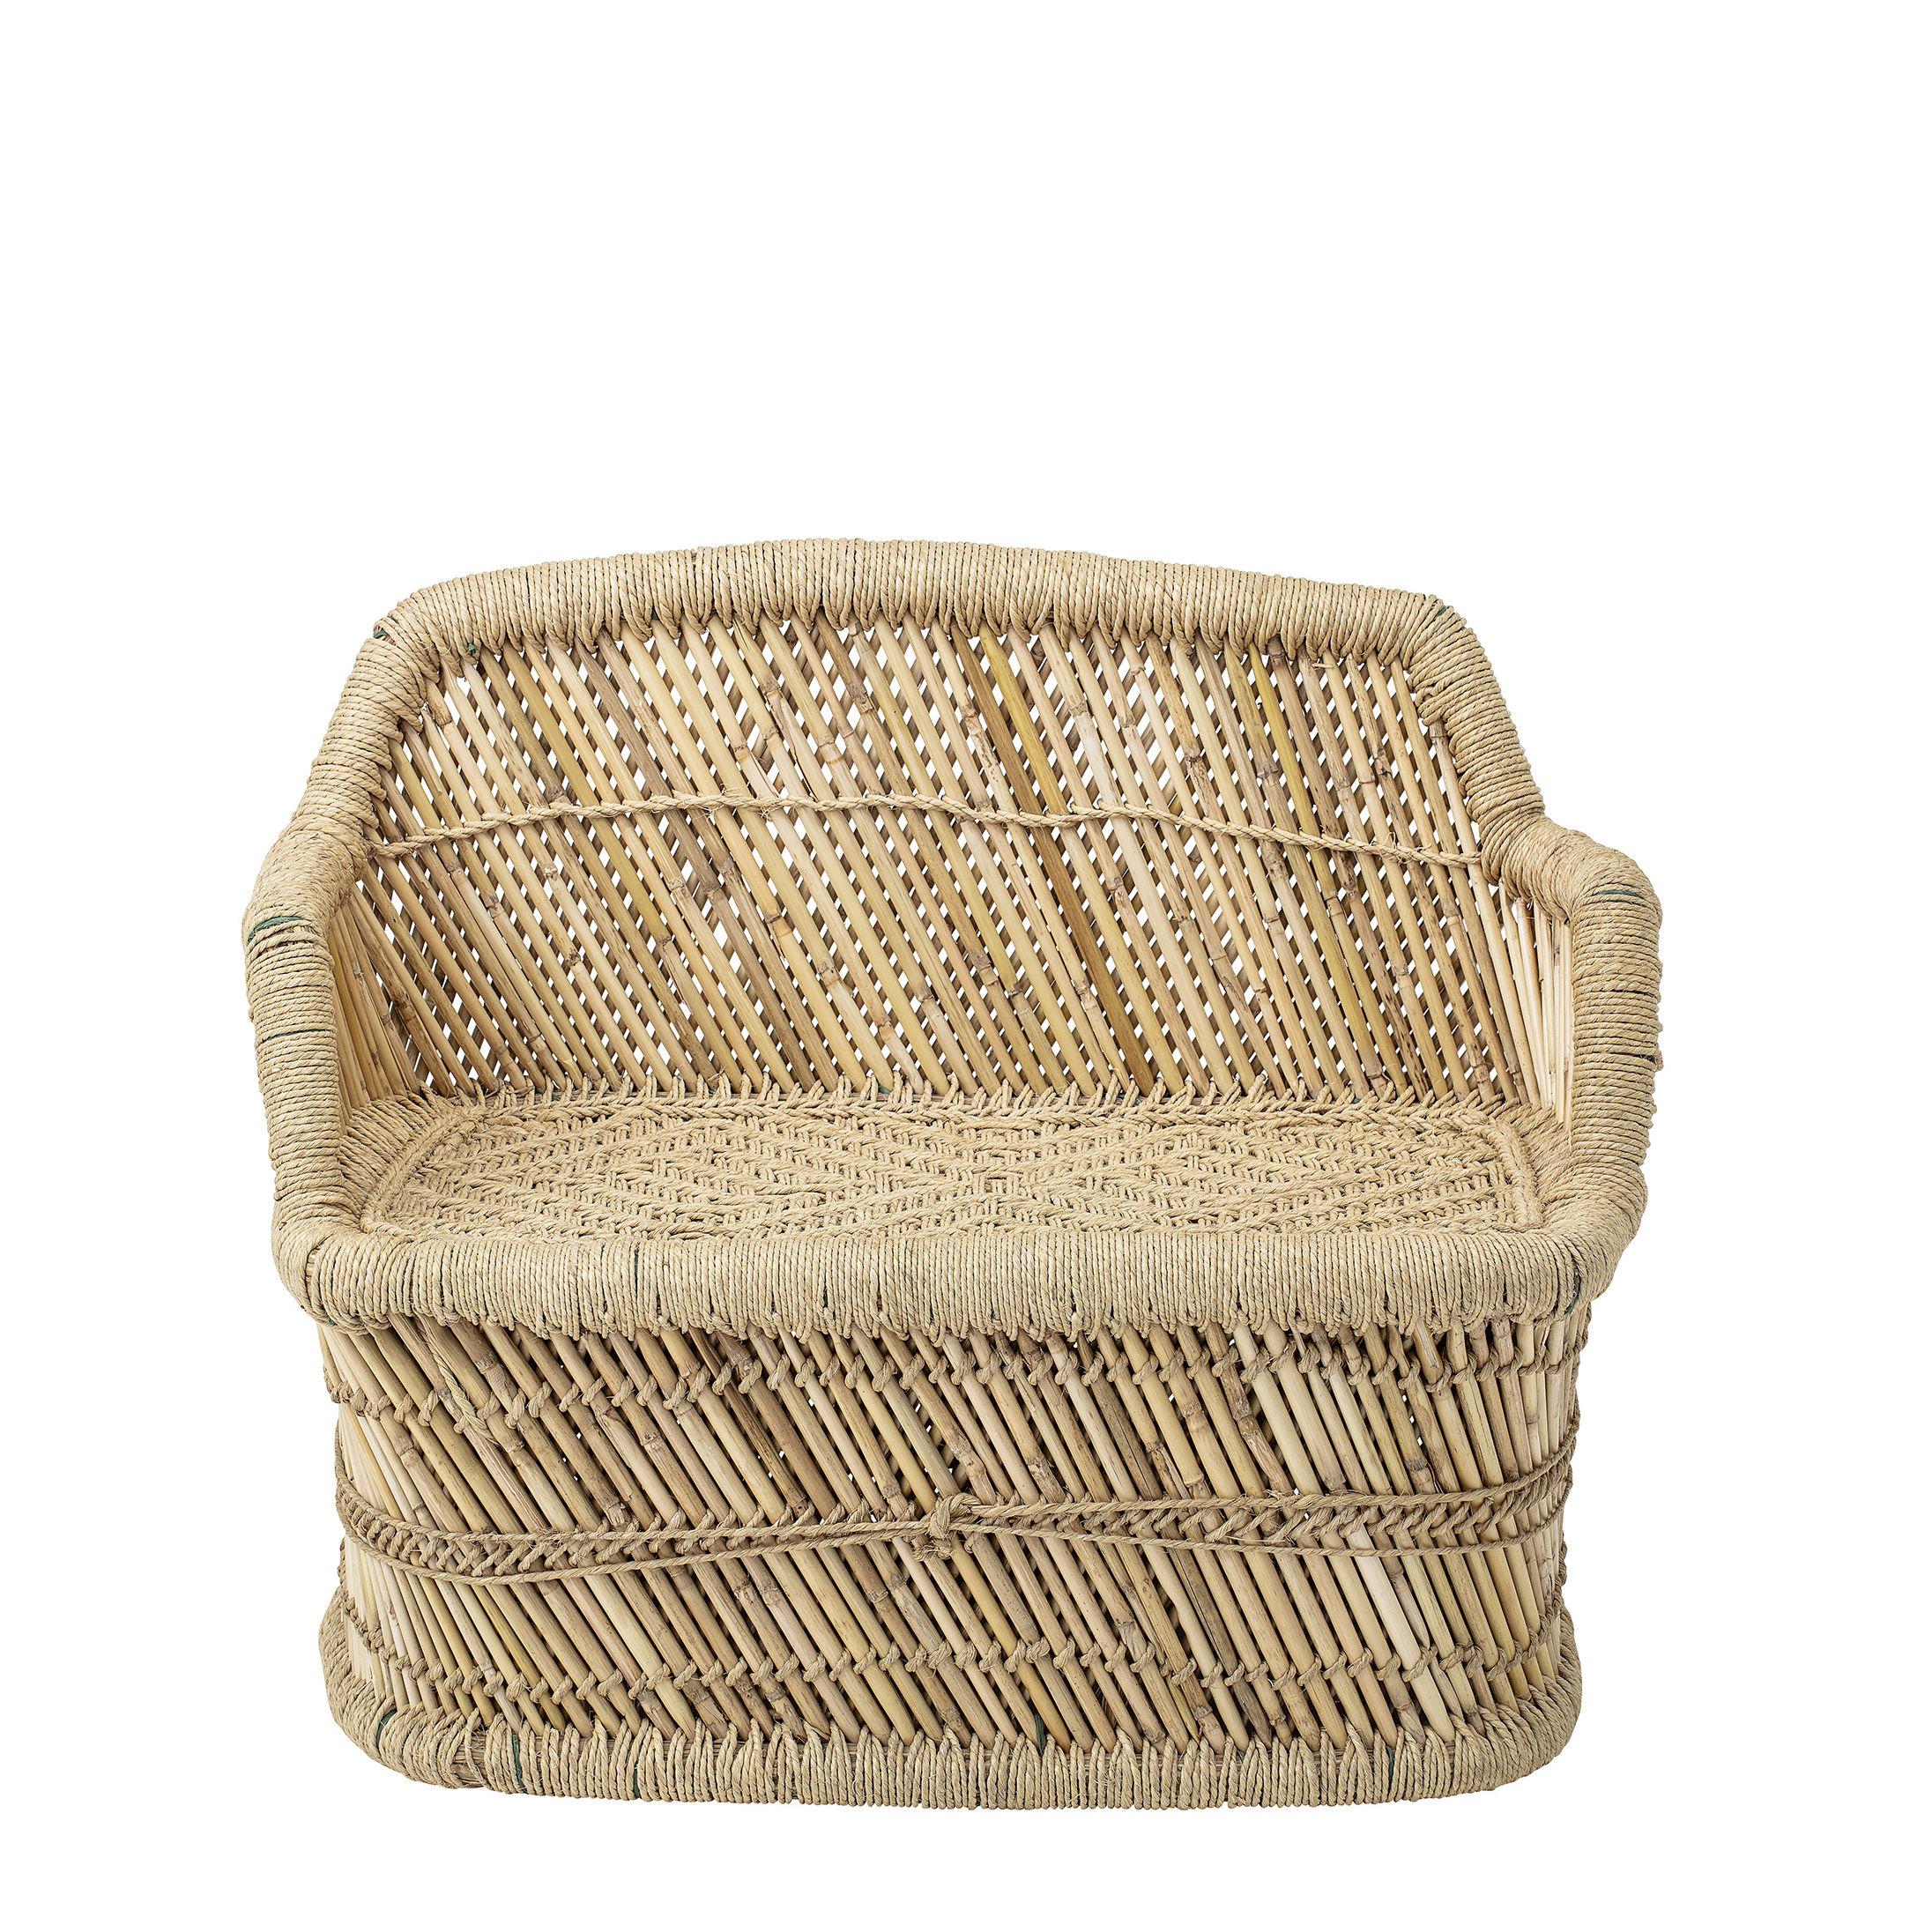 Furniture - Kids Furniture - Children's sofa - / Bamboo & hessian - L 61 cm by Bloomingville - Natural - Bamboo, Hessian